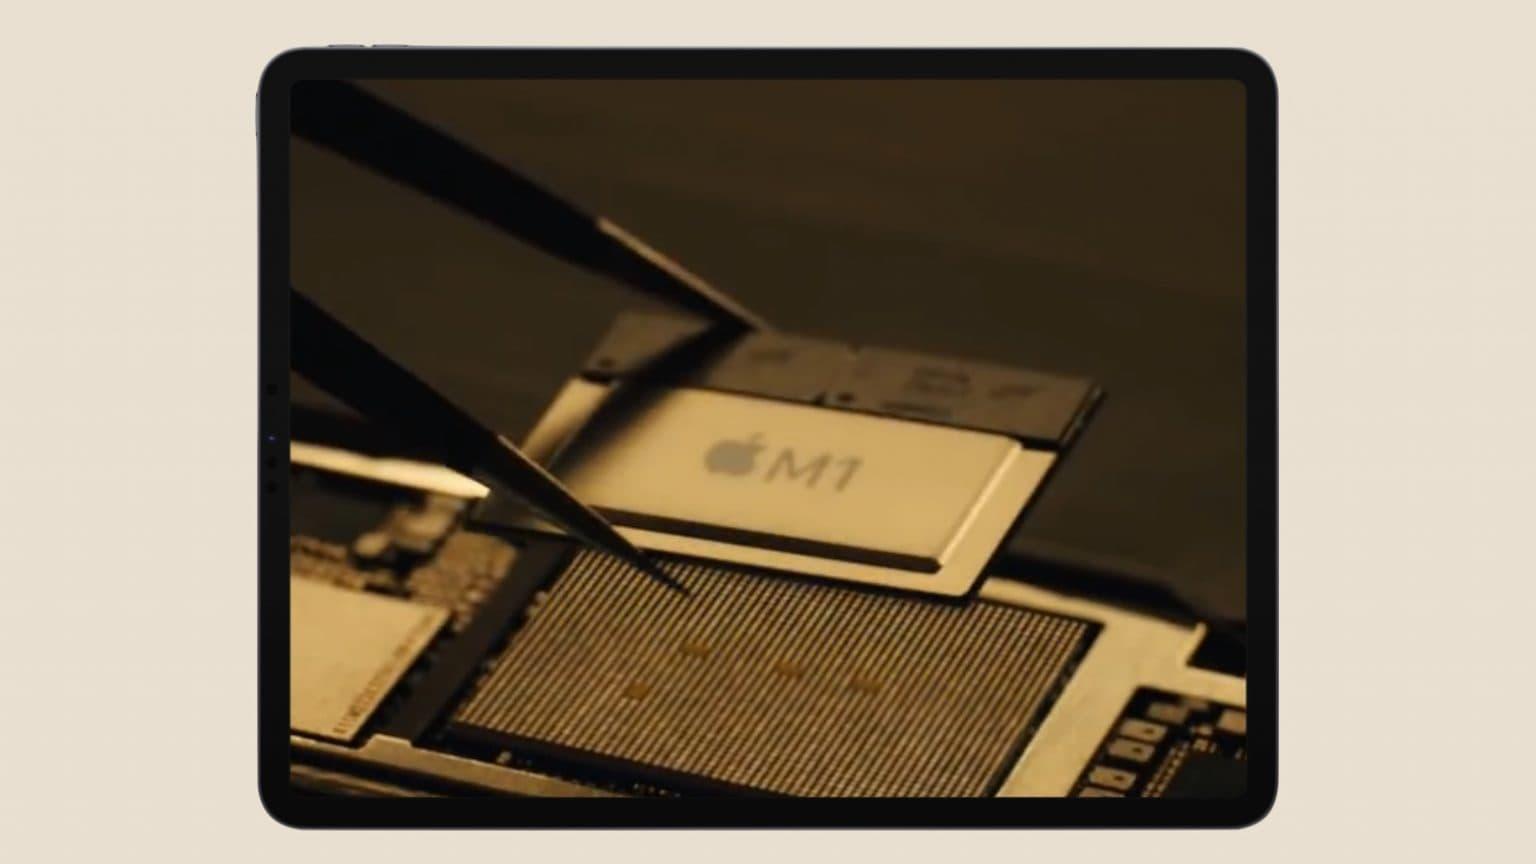 2021 iPad Pro with m1 processor